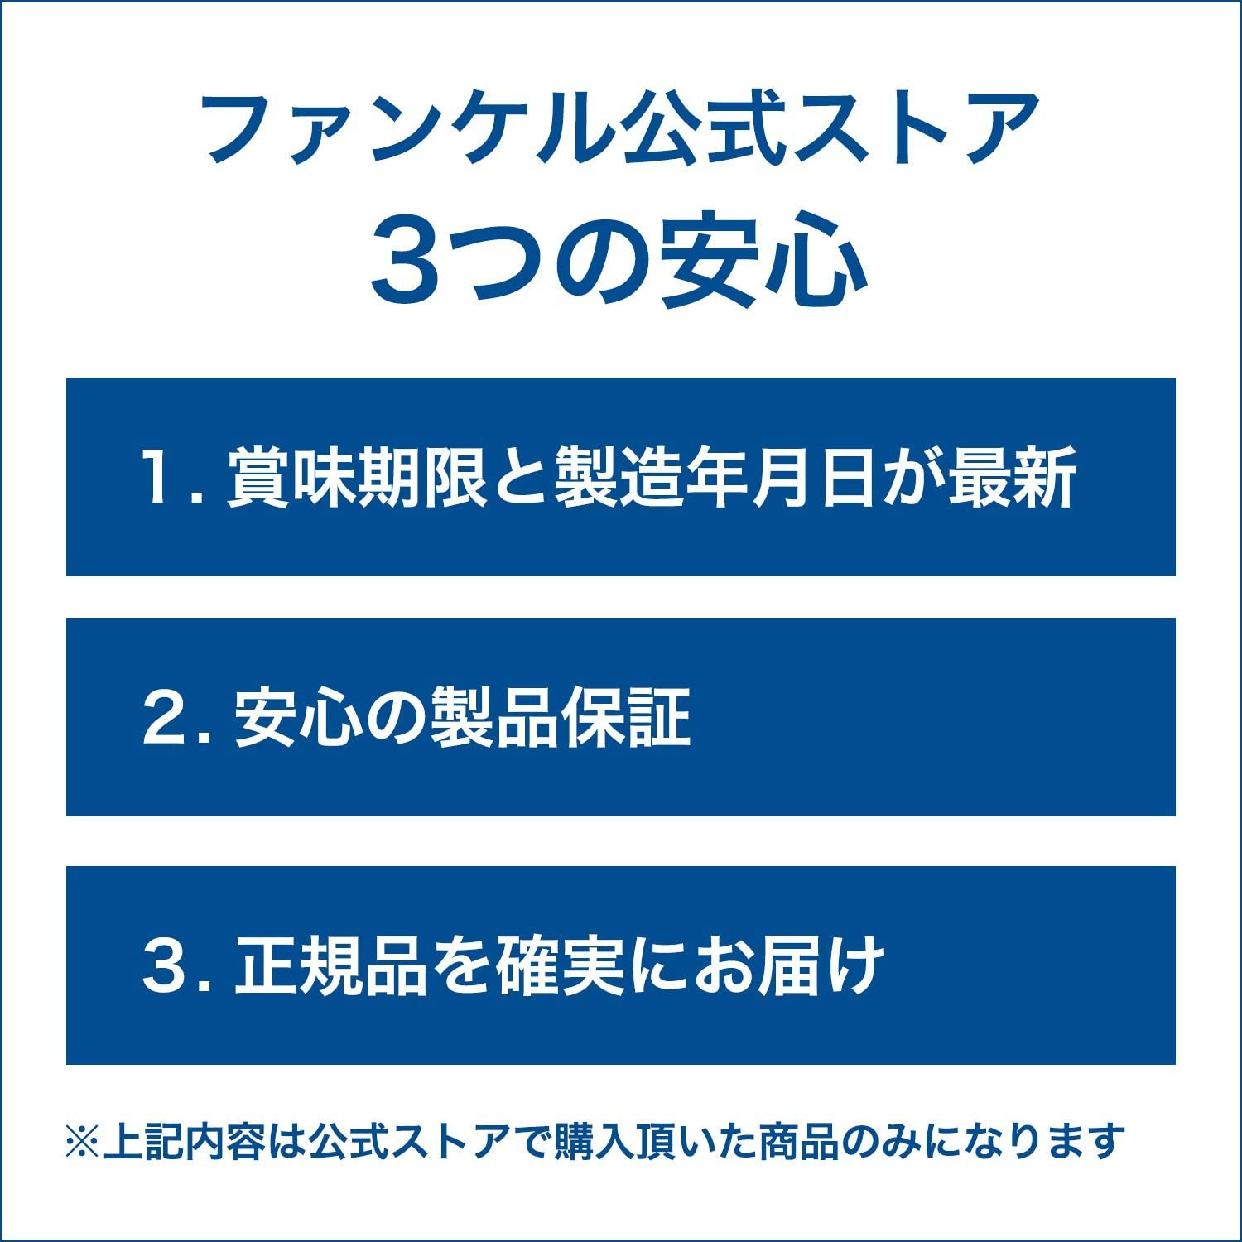 FANCL(ファンケル) エンリッチ 乳液 Ⅱ しっとりの商品画像7